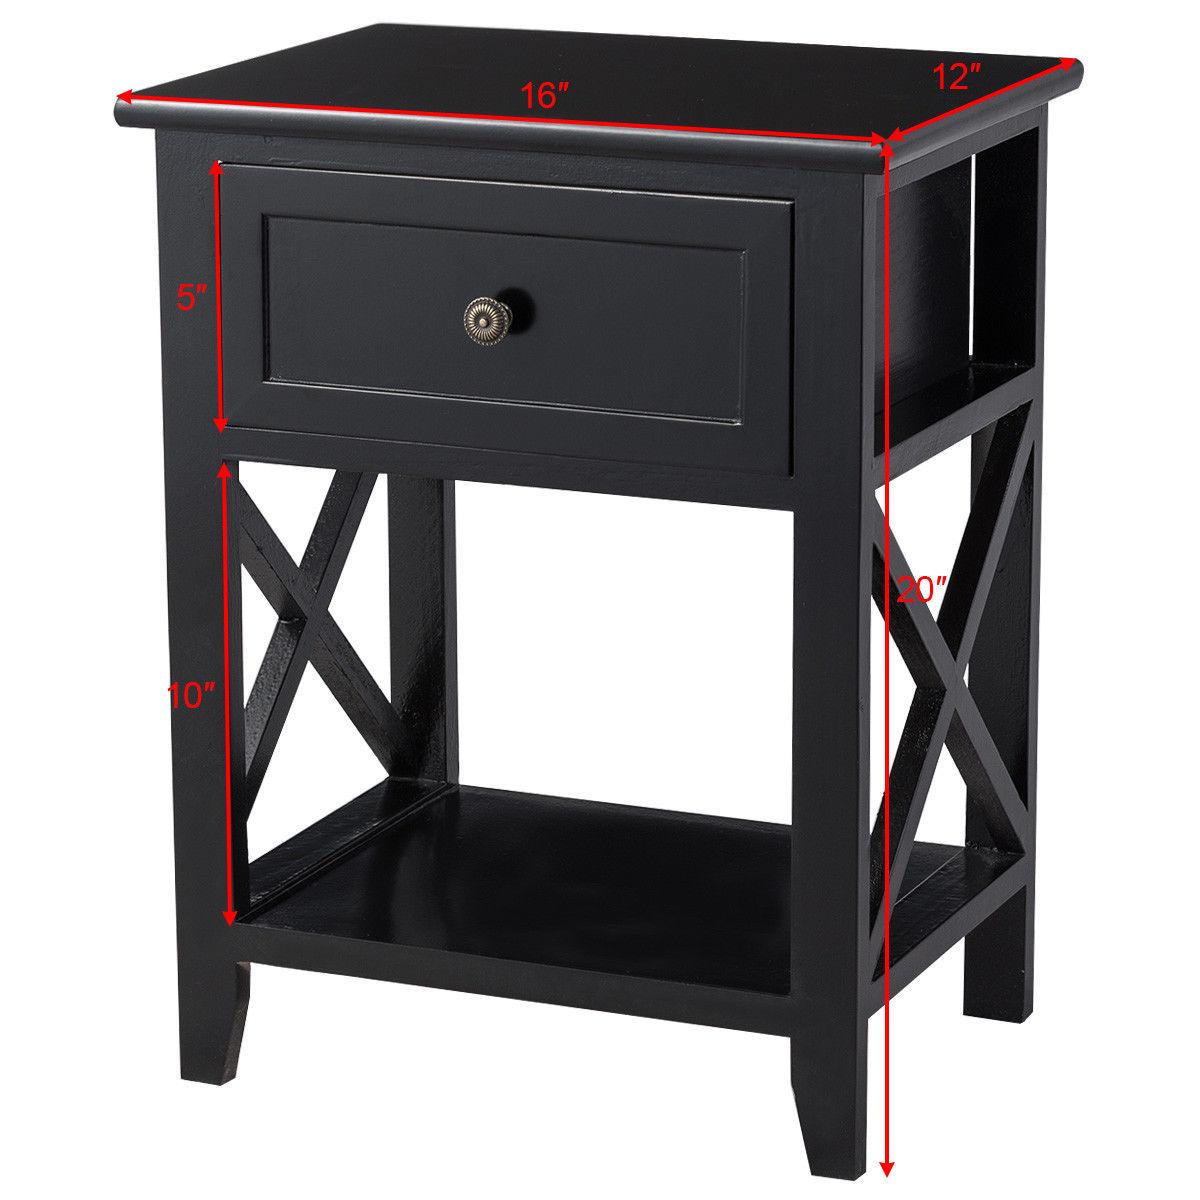 Costway End Bedside Table Nightstand Drawer Storage Room Decor W Bottom Shelf Black